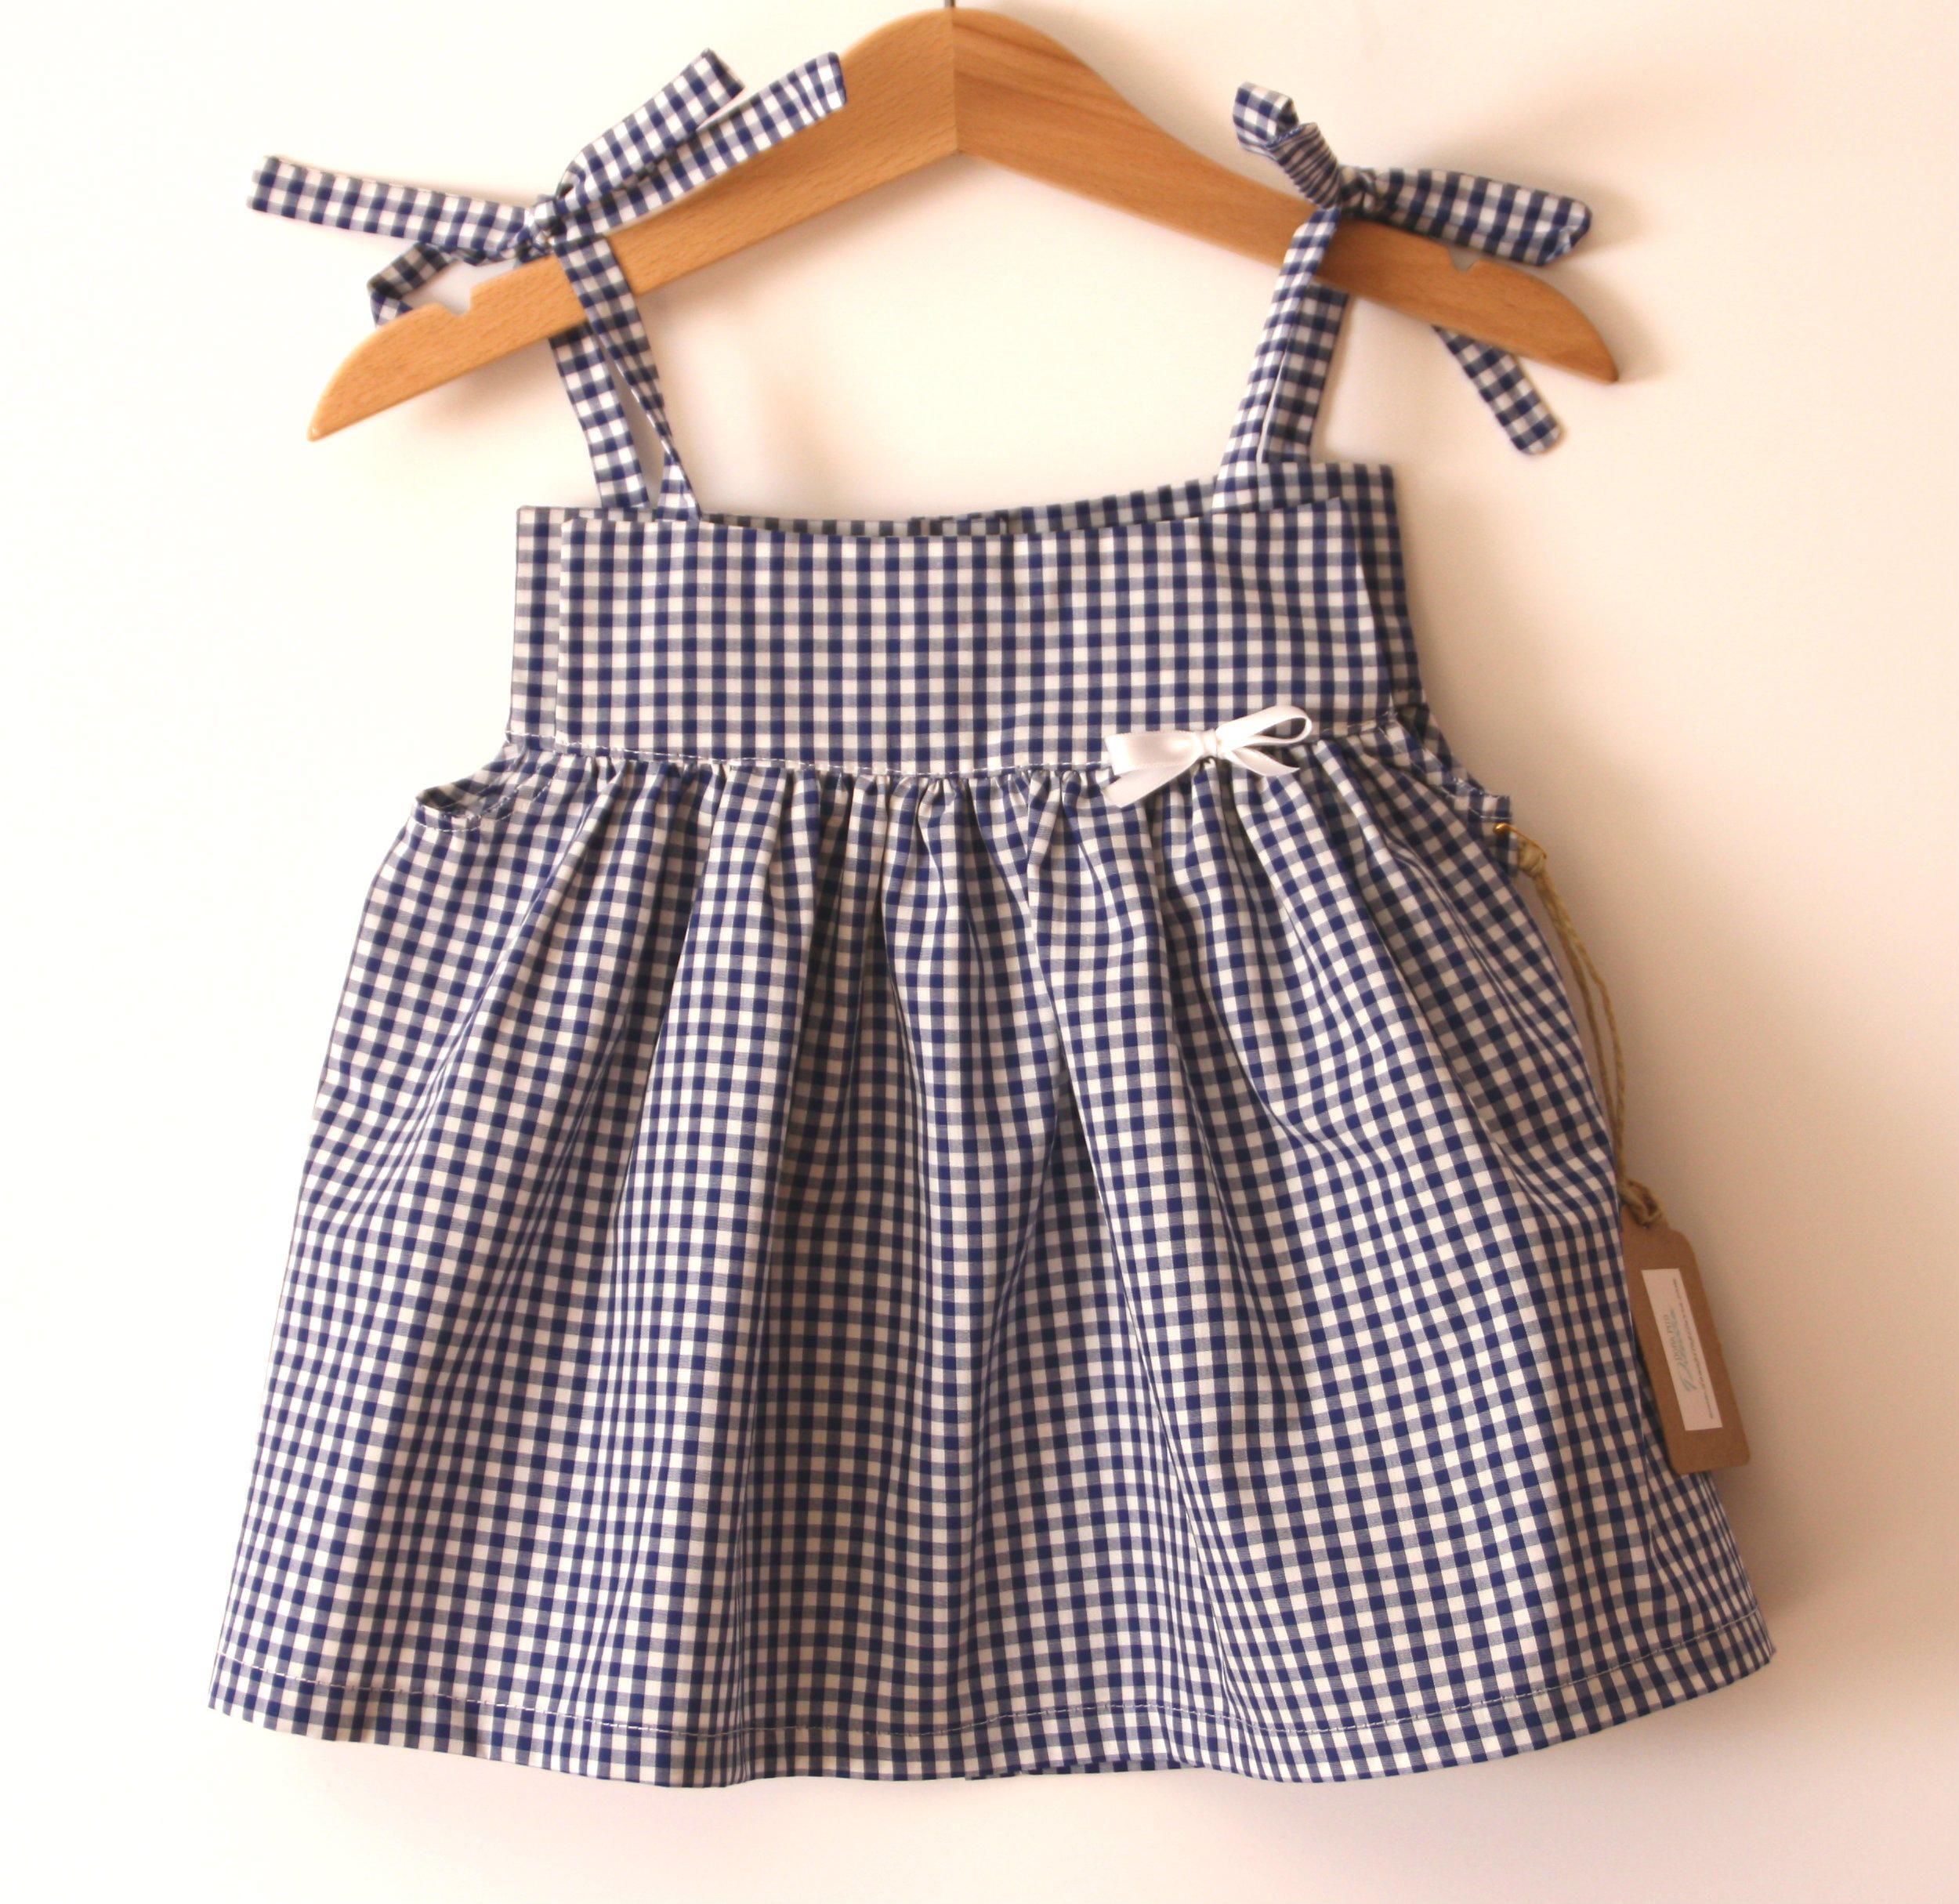 57c9d4203 Vestido vichy azul marino tirantes fruncido,vestido niña,blusa niña,vestido  marinero,vestido verano,vestido azul,blusa vichy,blusa marinera de ...